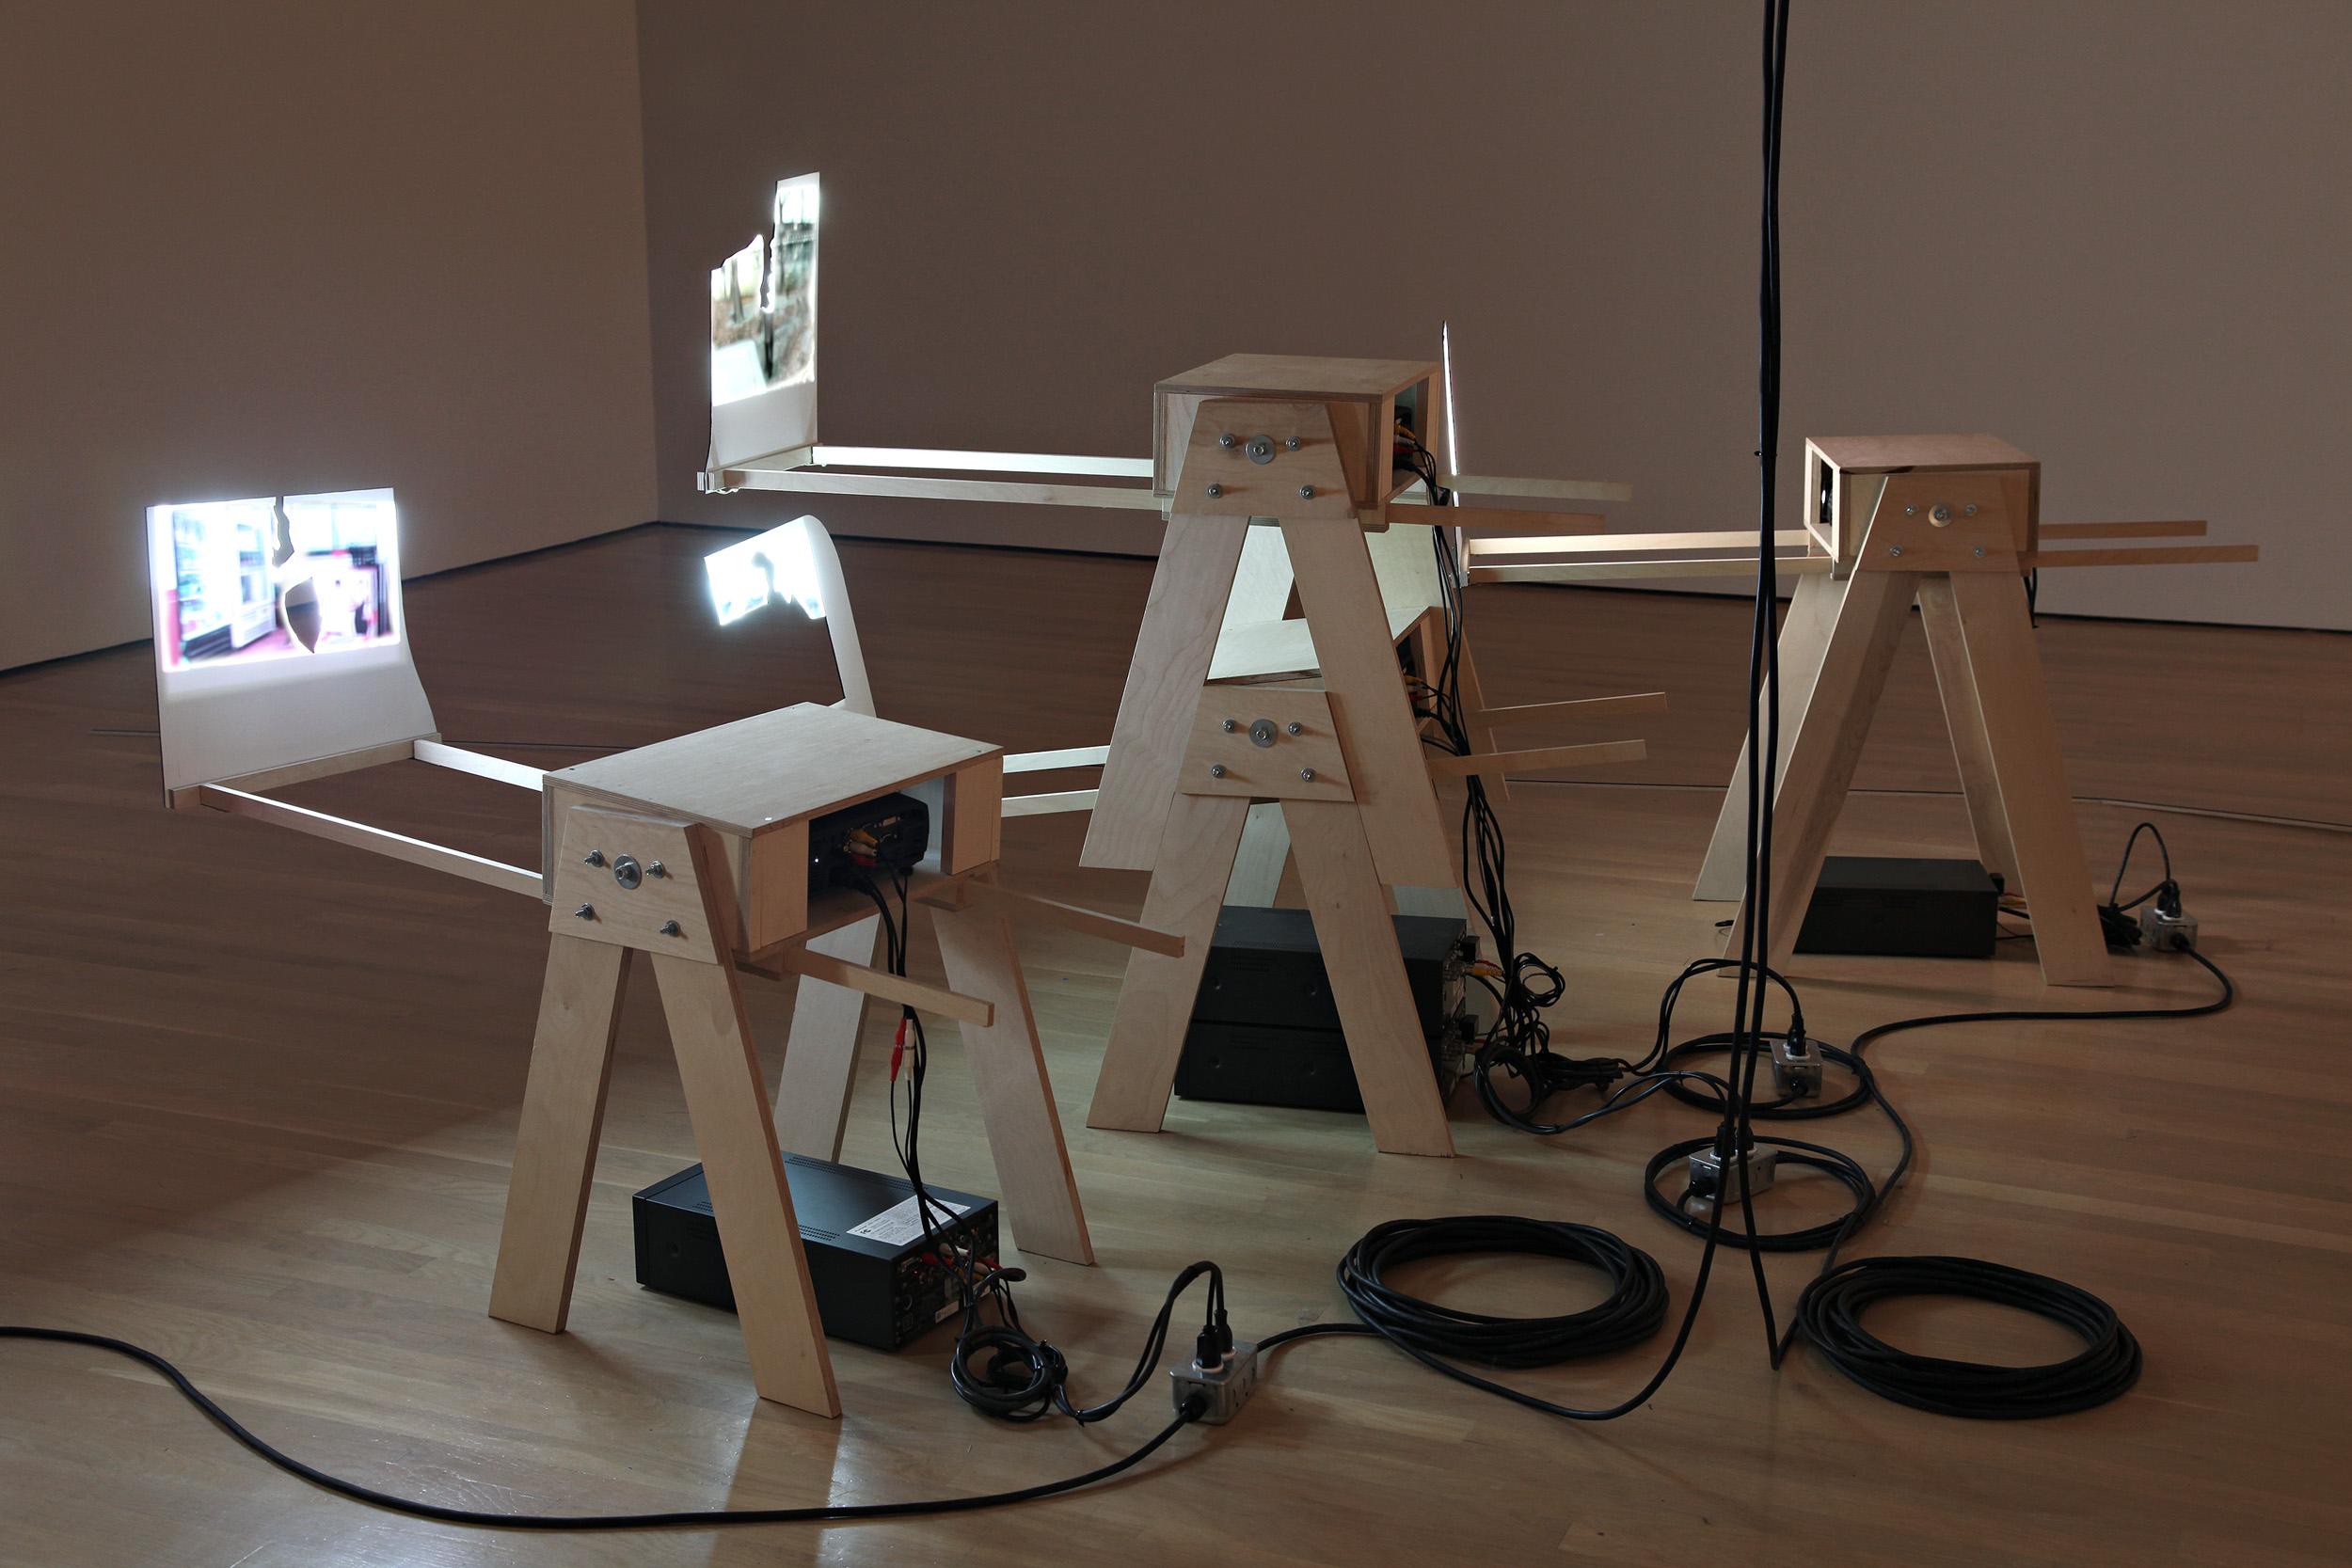 Cuba Still (Remake) , detail of installation at Gallery B-312, Montreal, 2005